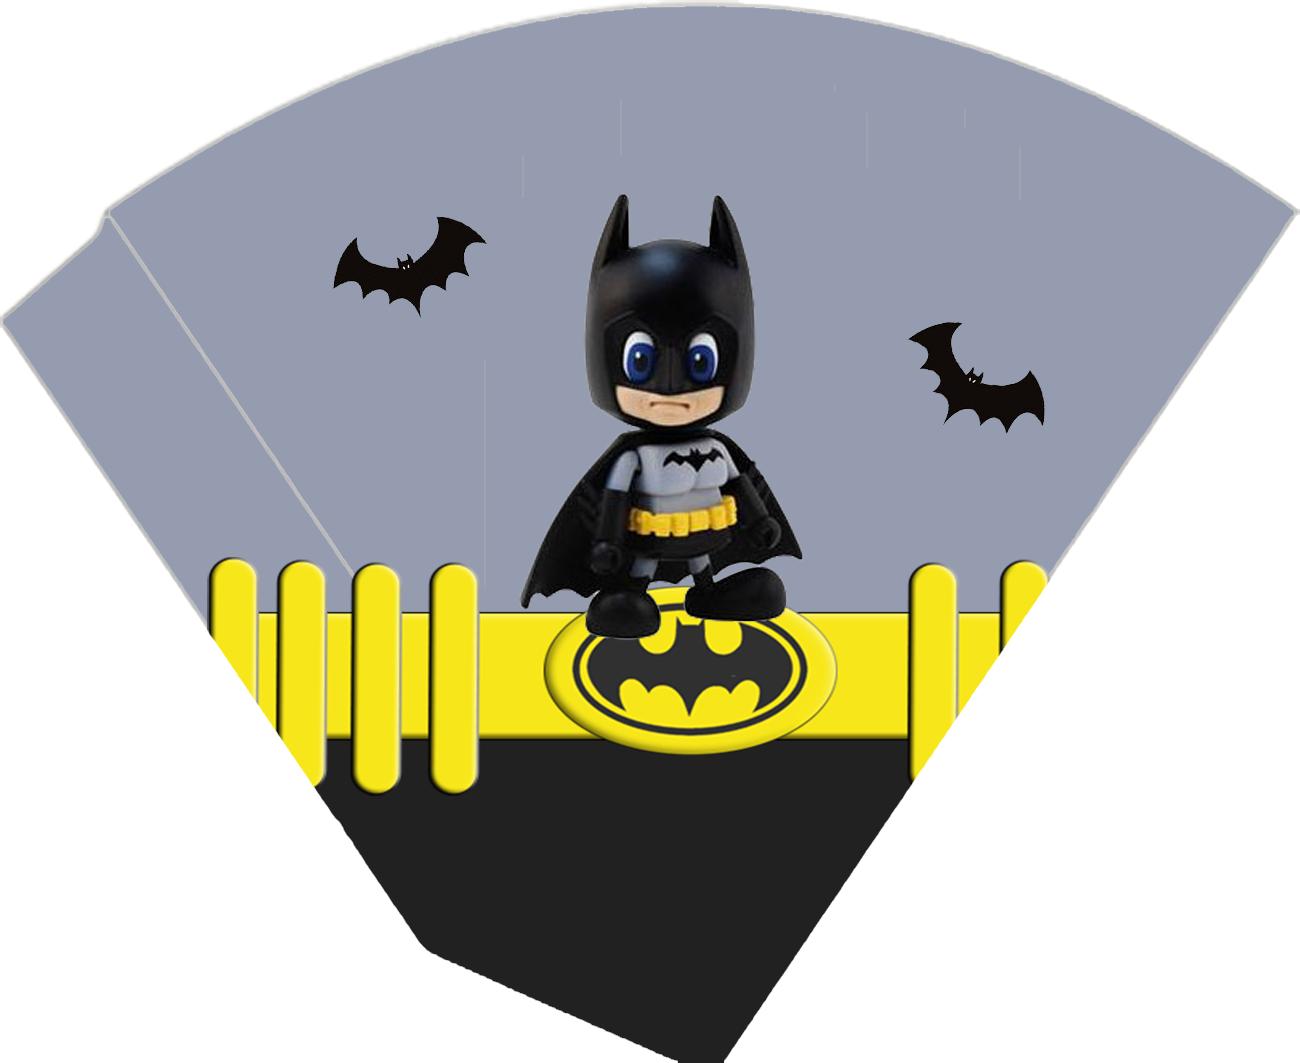 batman baby free printable labels  free party printablew printable superman logo images printable superman logo images